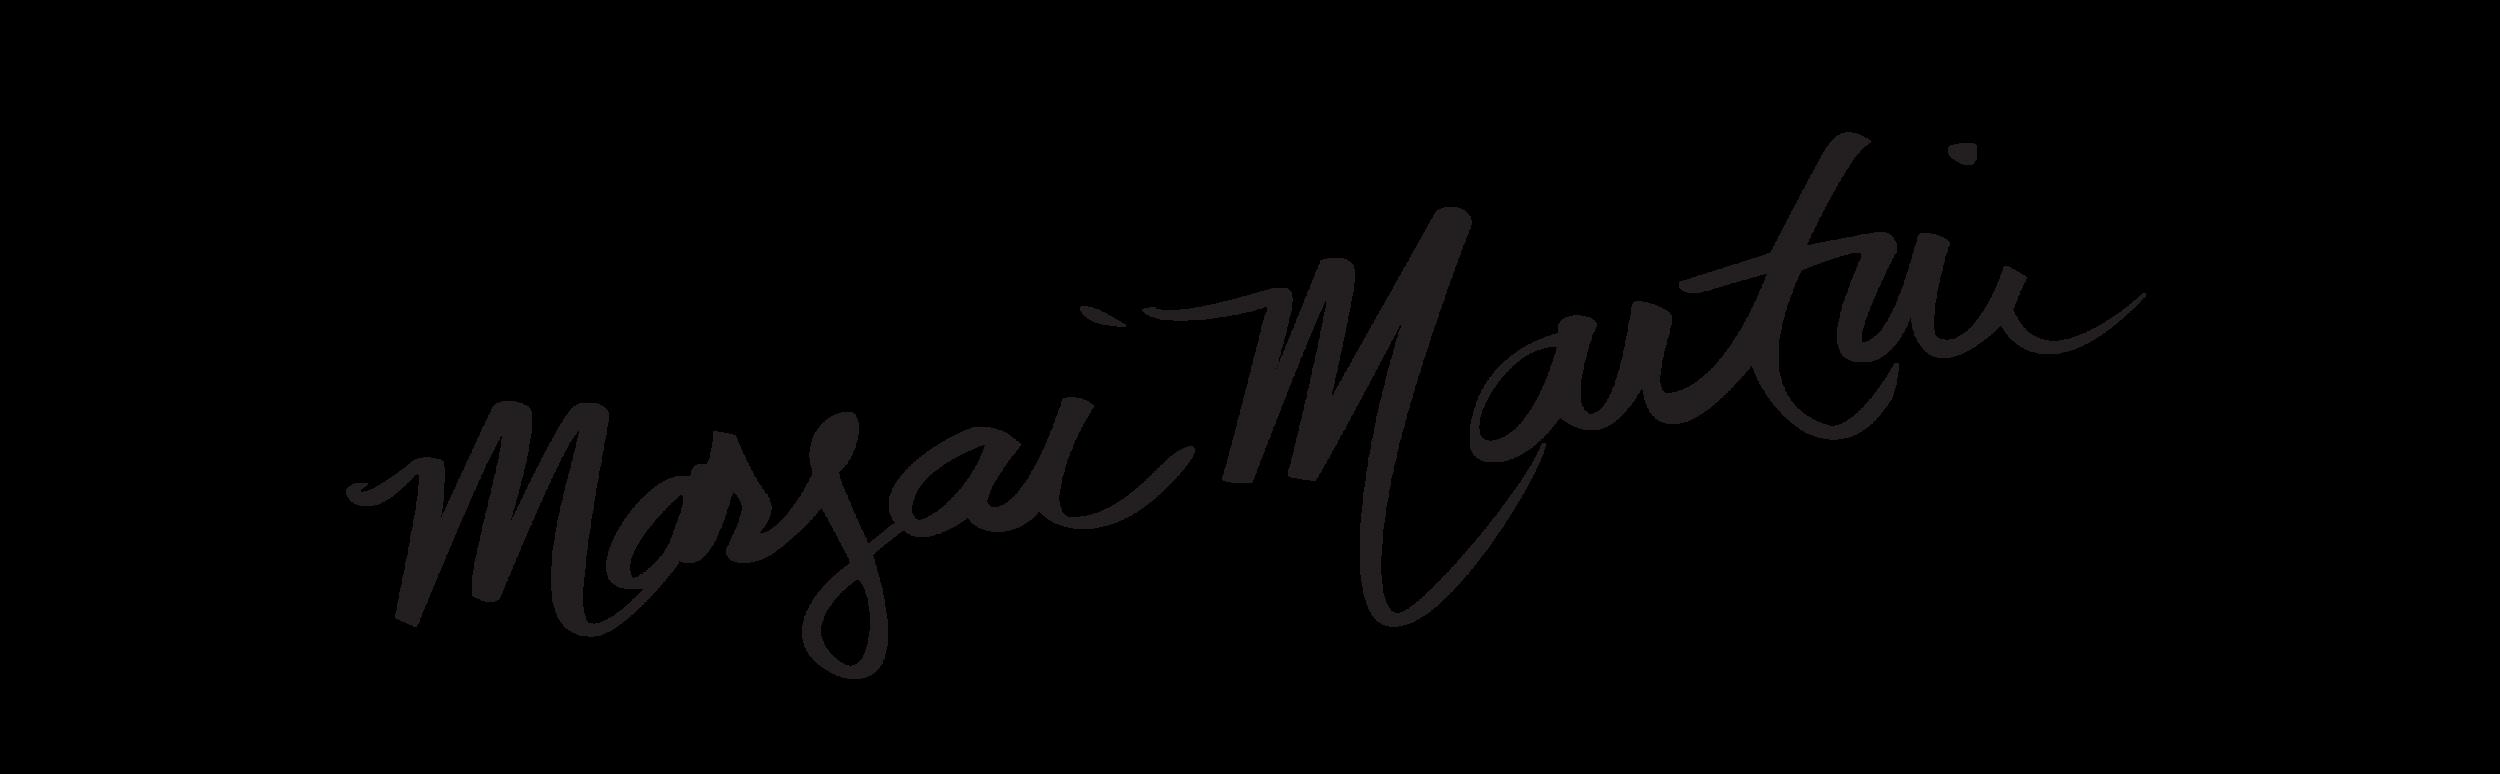 Marsai Martin Signature-02.png